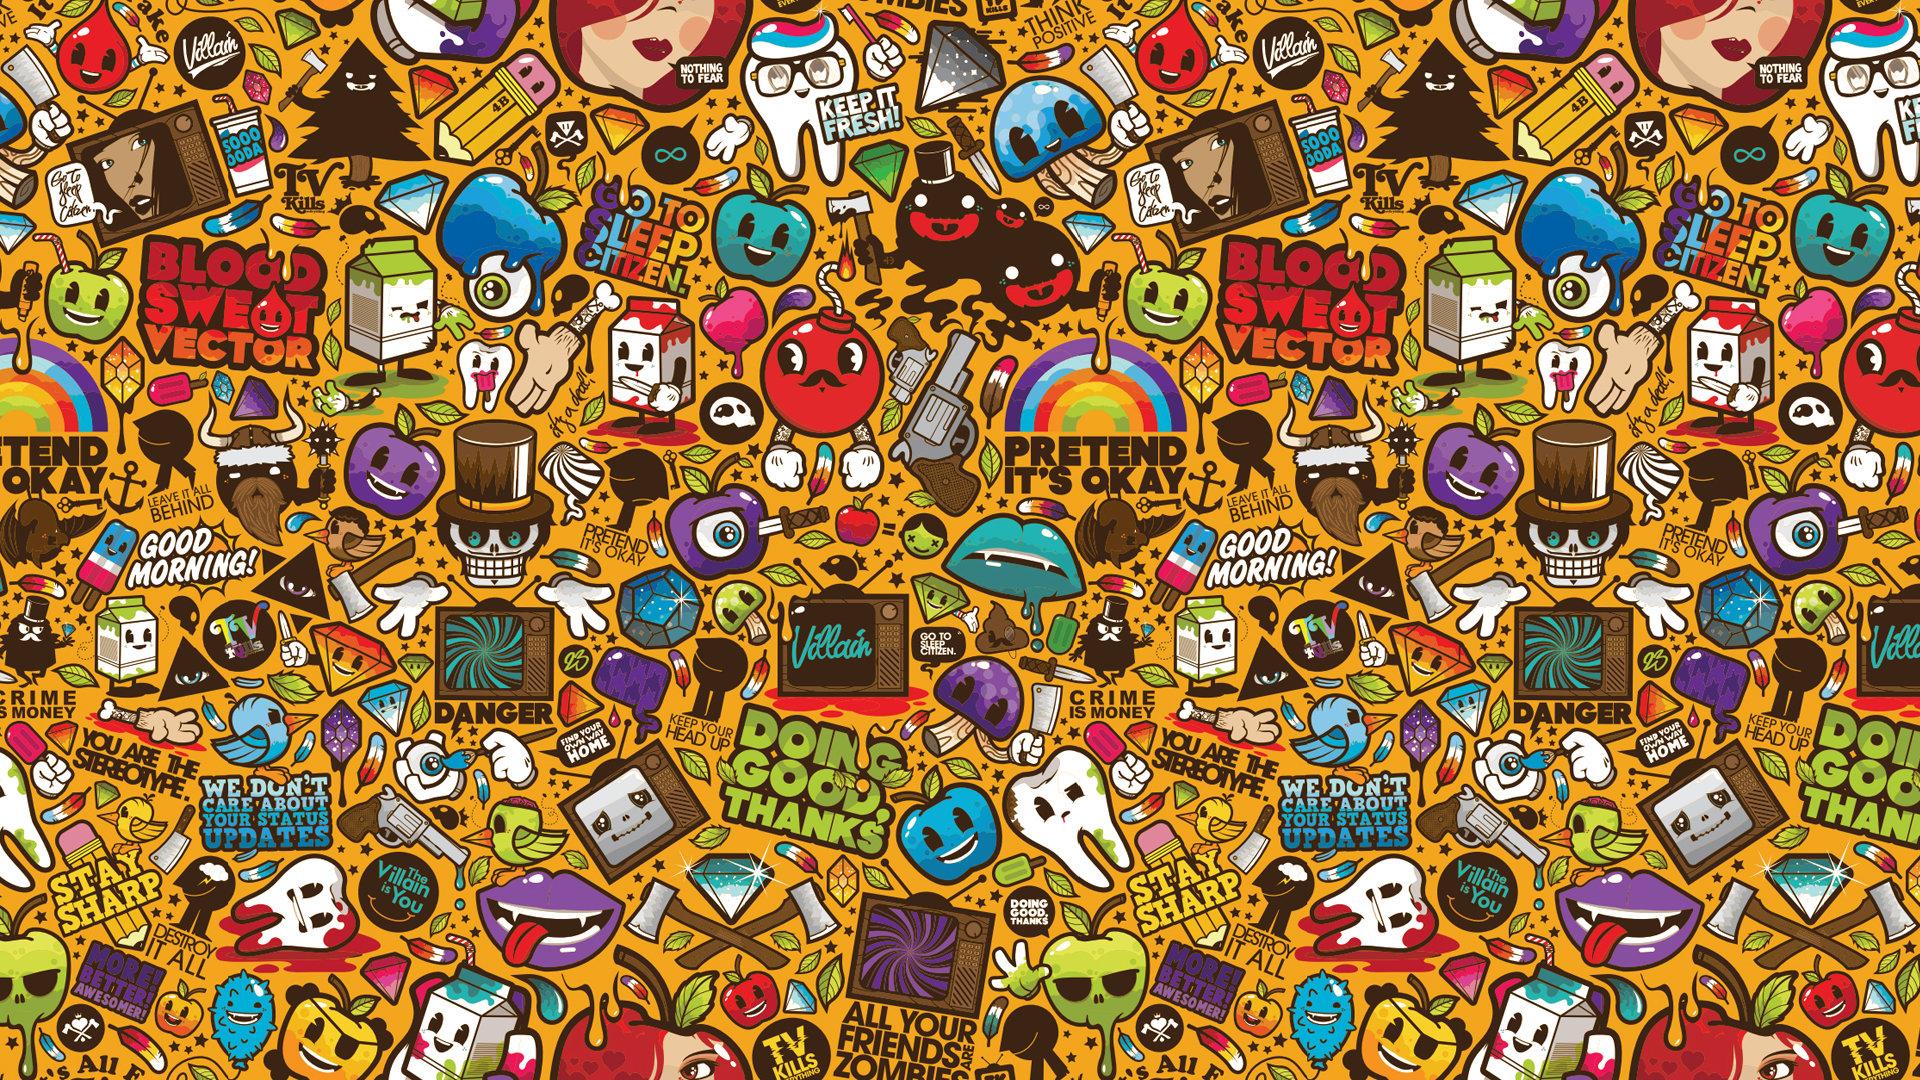 Fun Images Sticker Bomb Wallpaper Hd